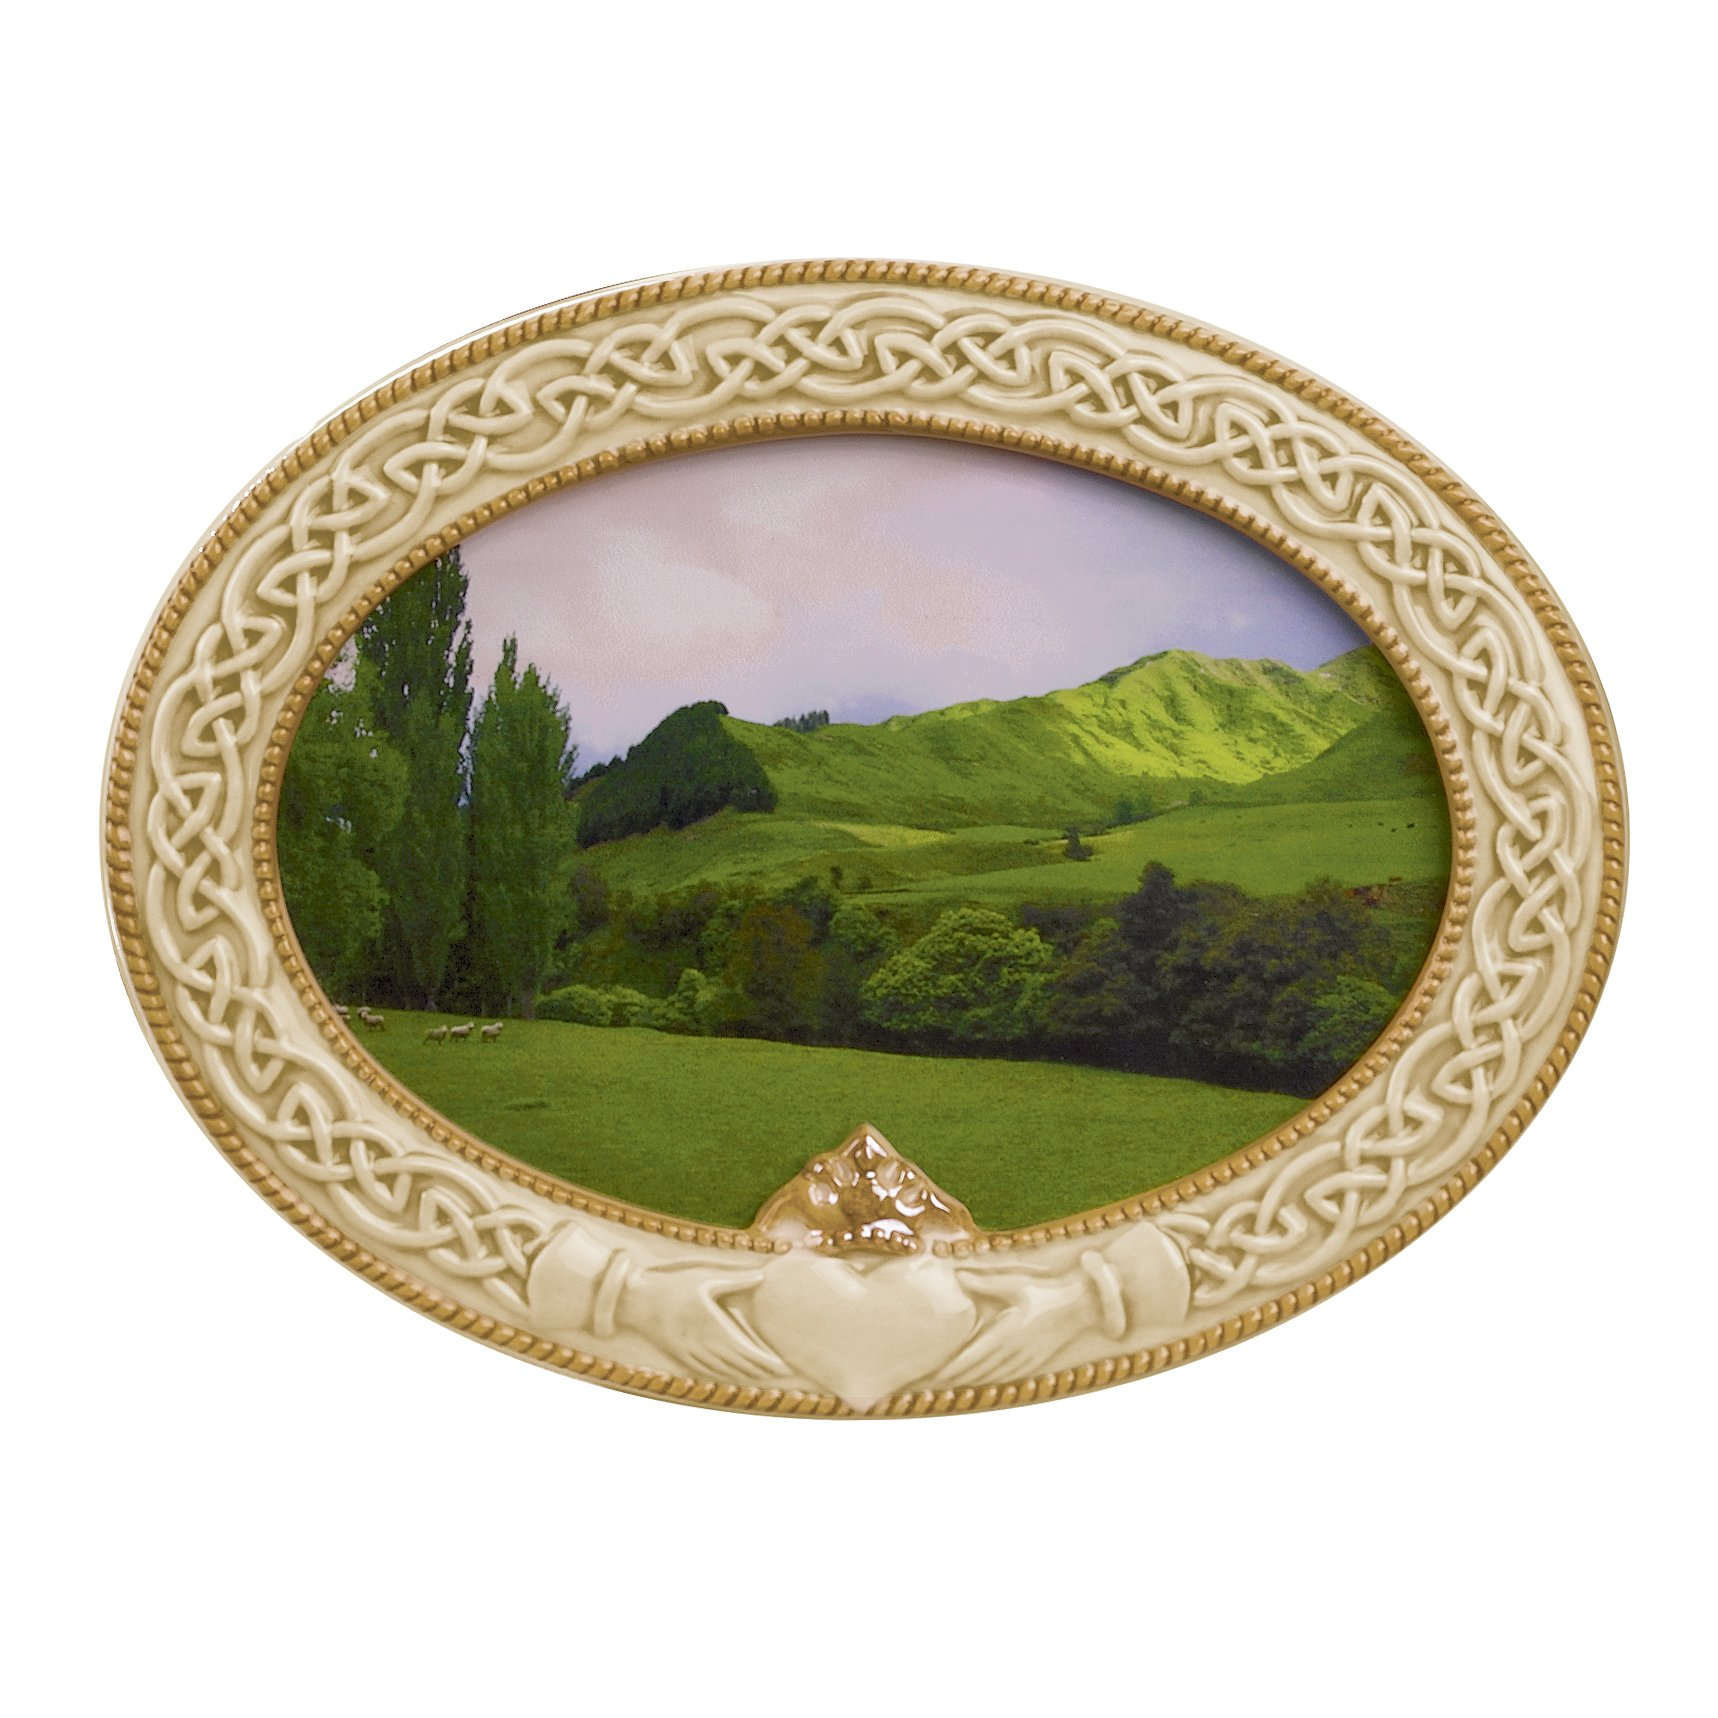 Grasslands Road 448684 Celebrating Heritage Celtic Claddagh Frame, 5-1/2 by 7-1/2-Inch, Holds 4 by 6 Photo